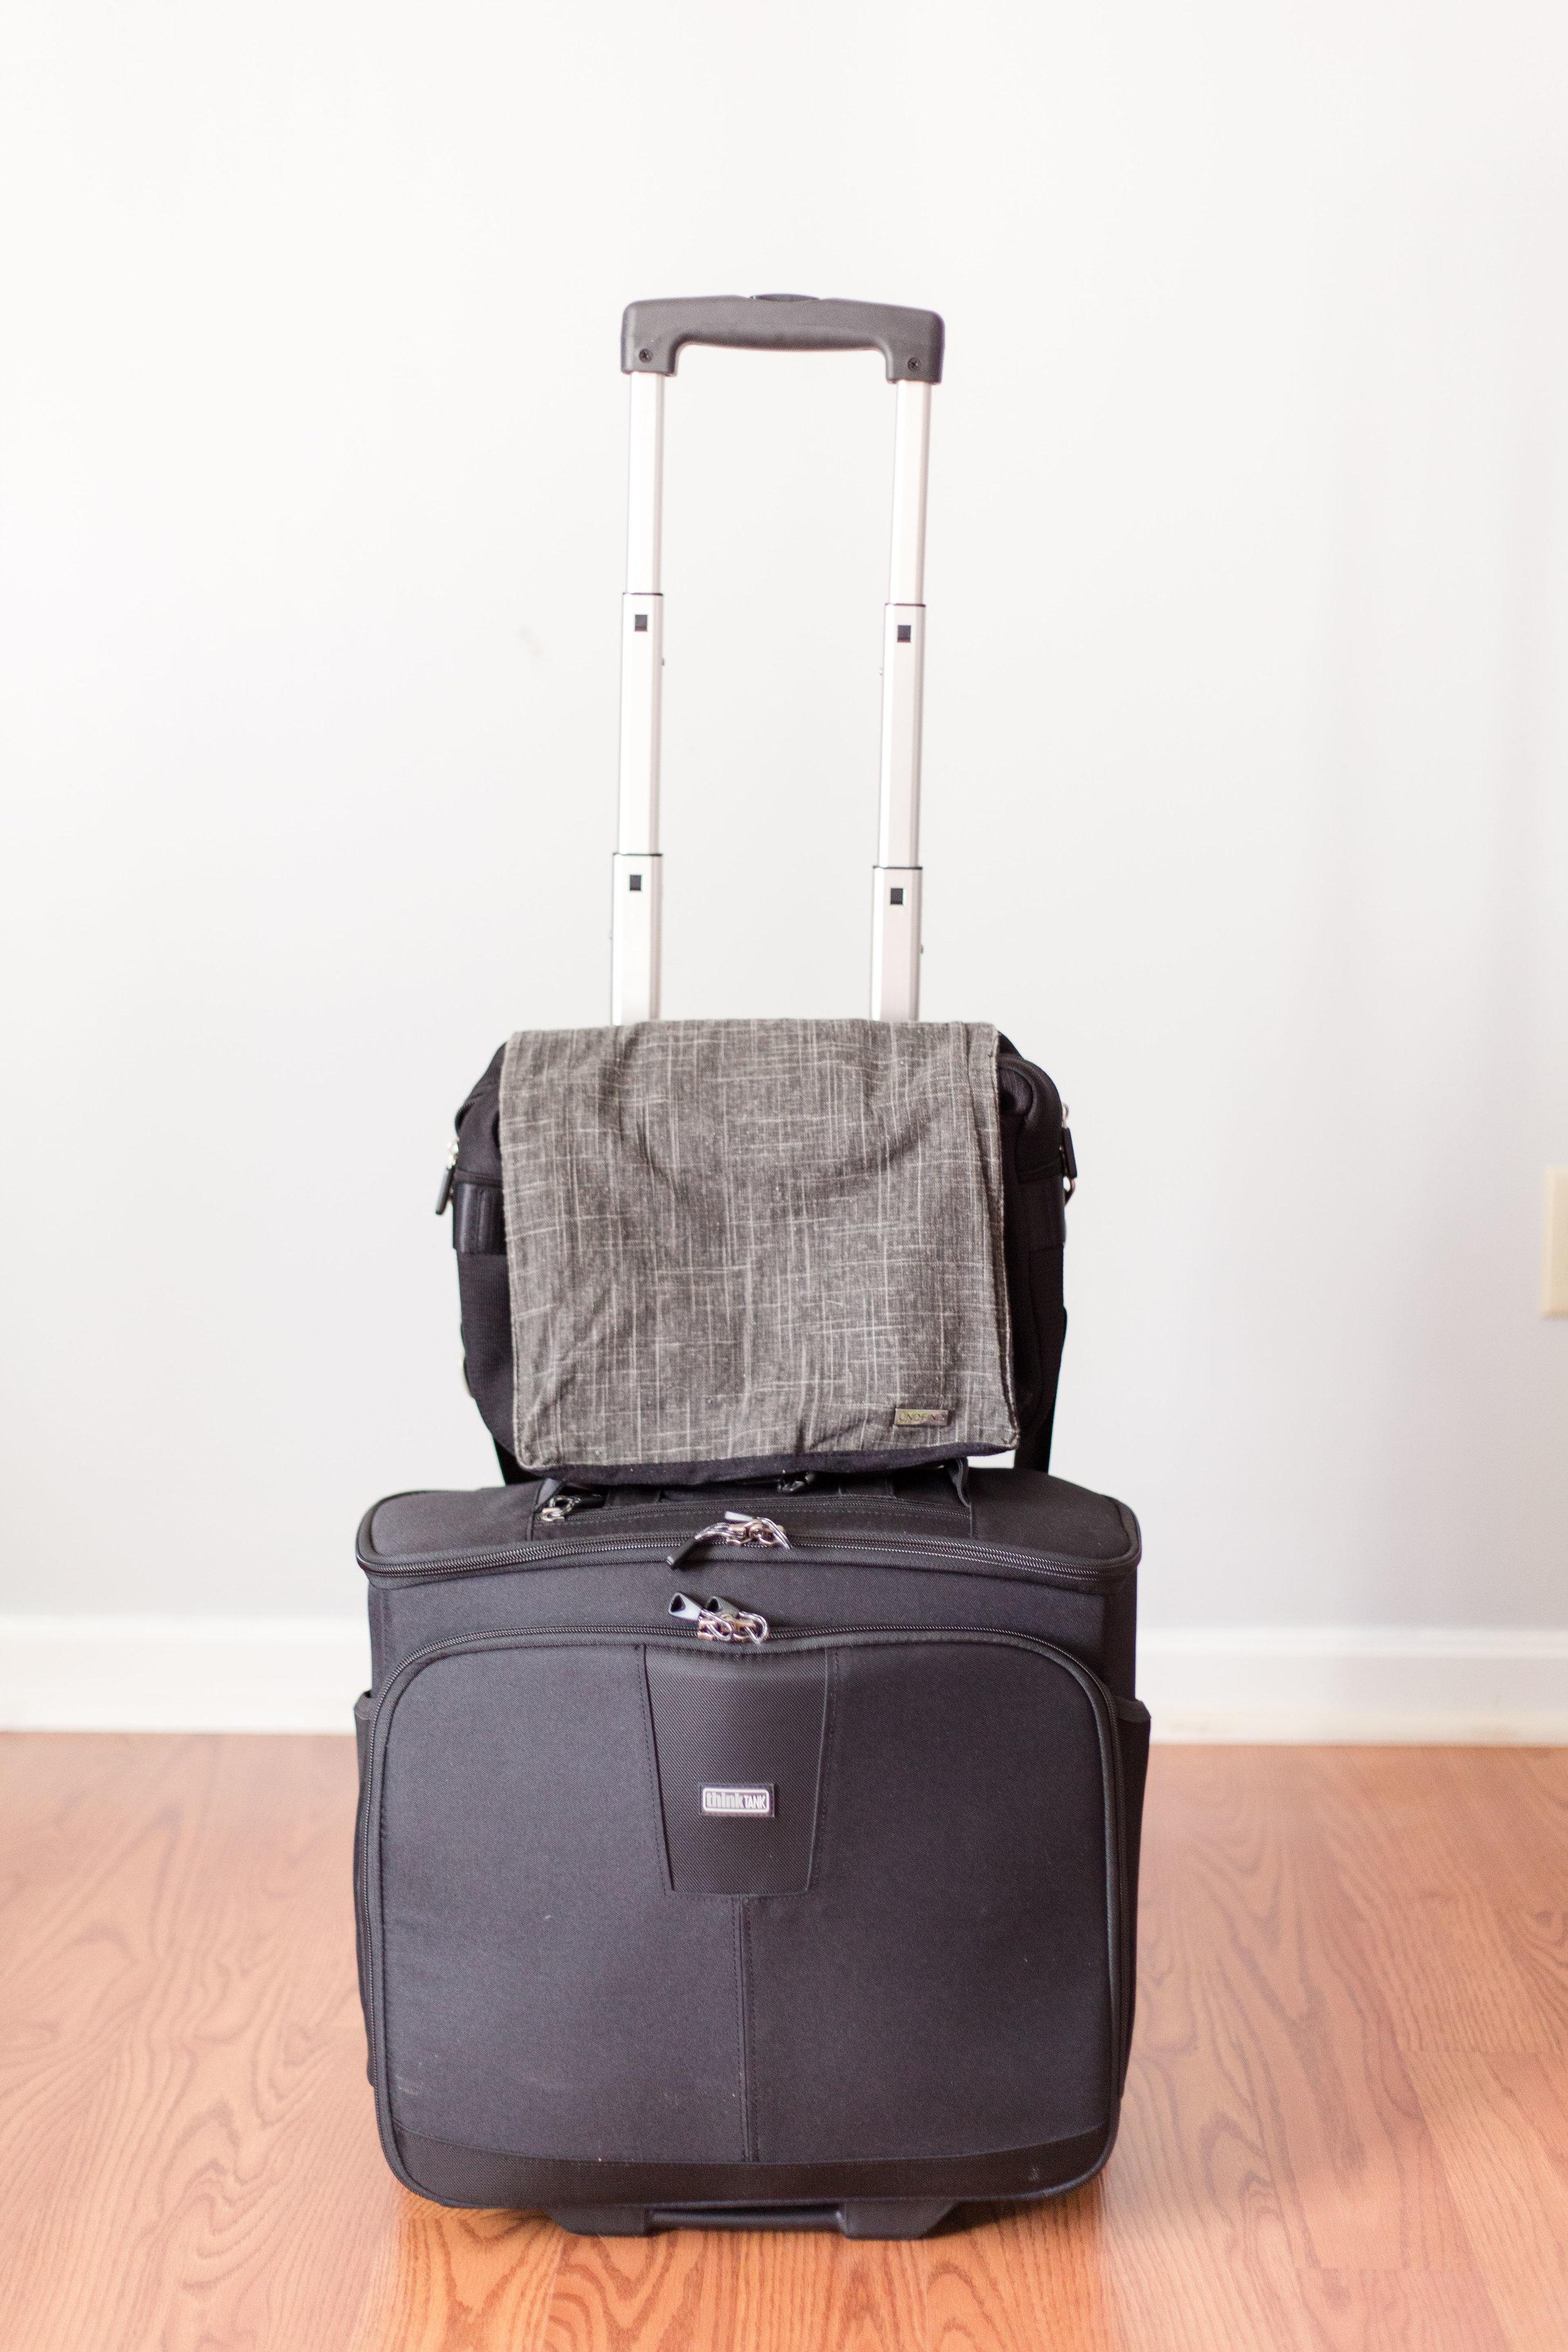 unfind waist shooter on thinktank airport navigator